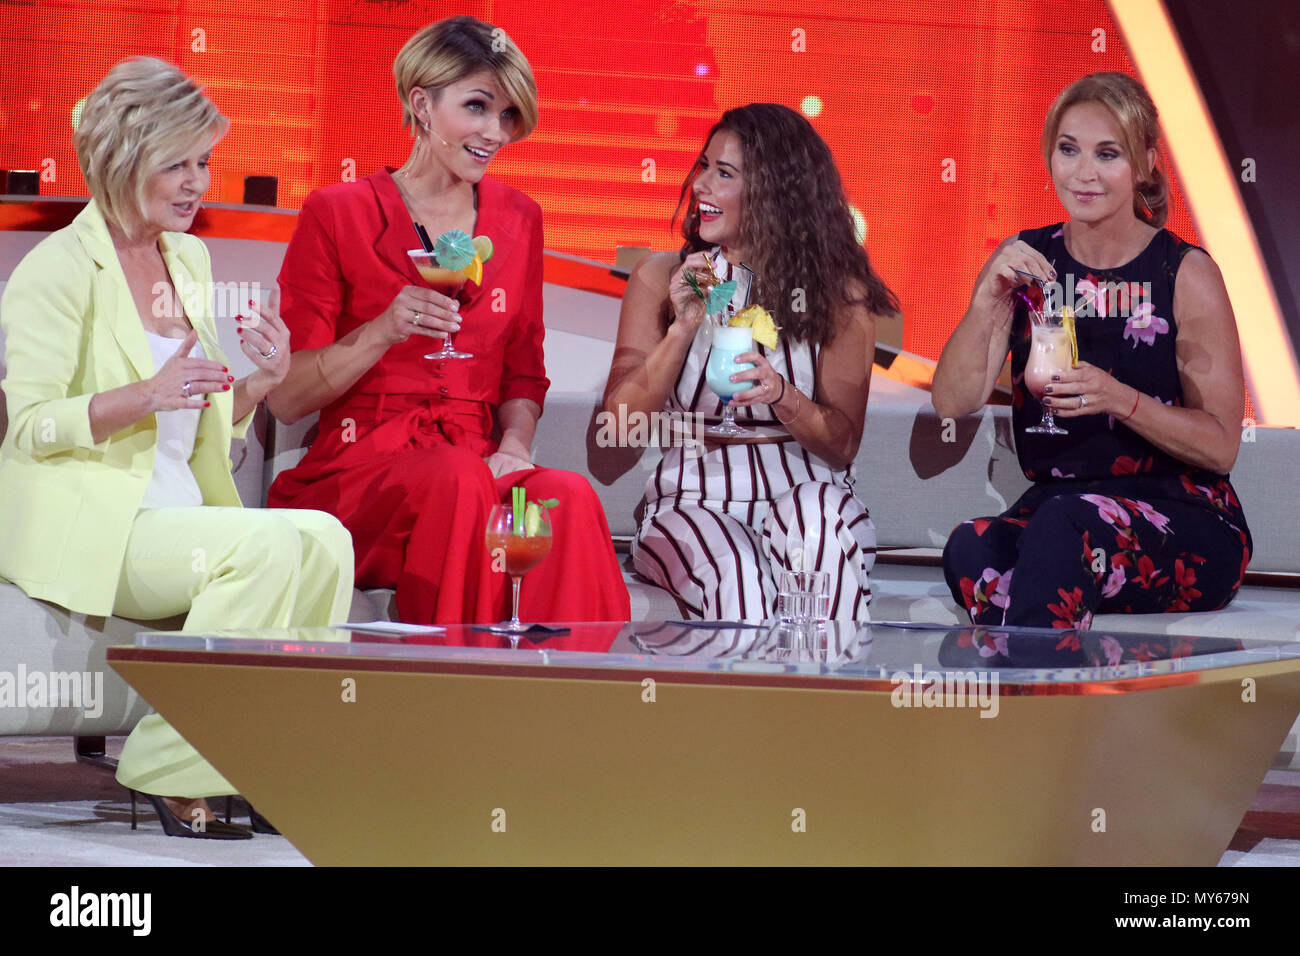 Carmen Nebel Show Riesa 05052018 Featuring Carmen Nebel Anna